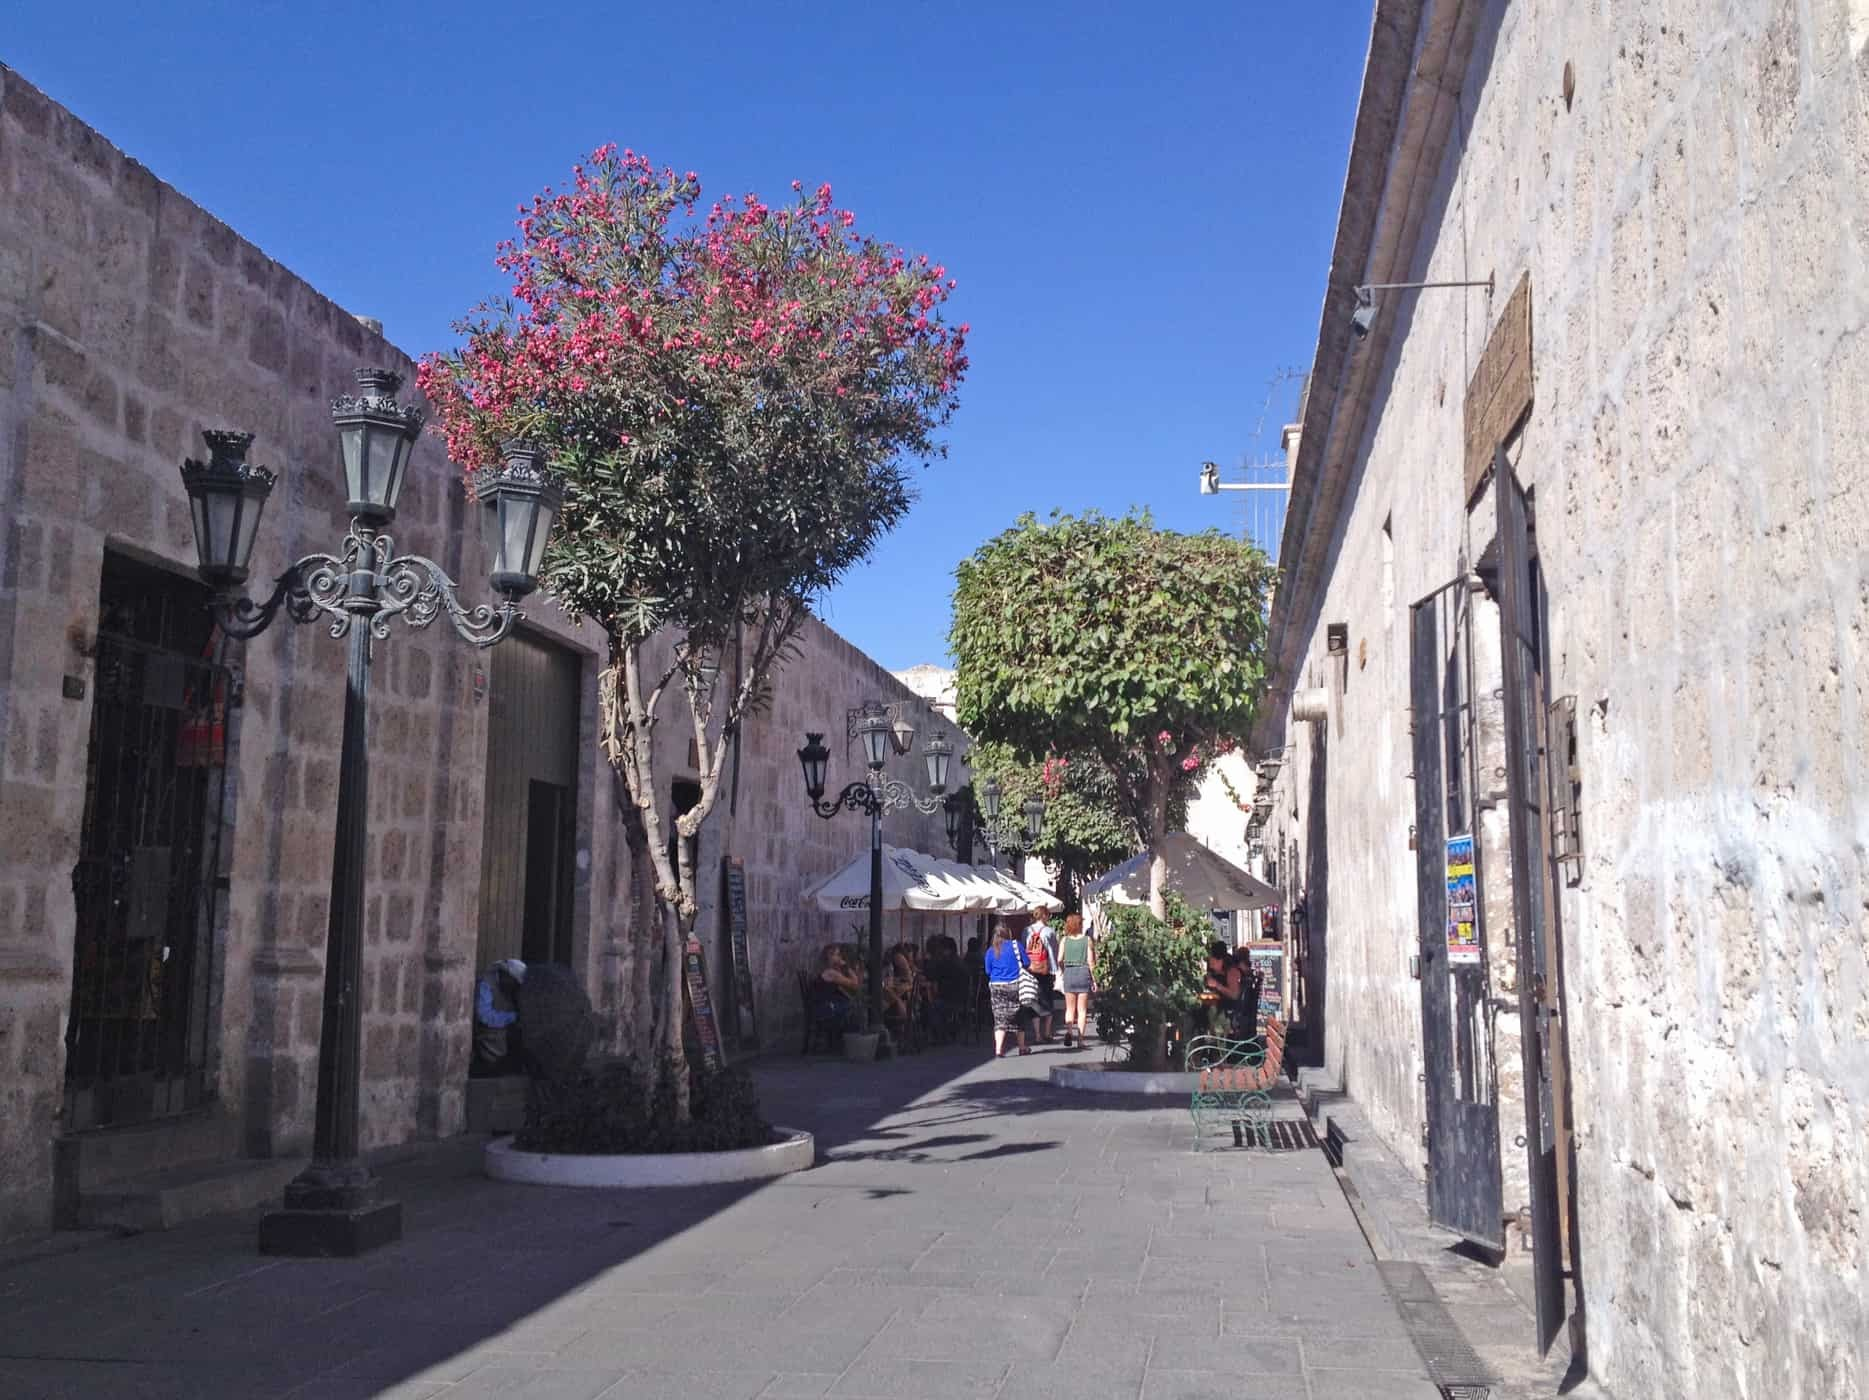 The pretty streets of Arequipa, Peru.